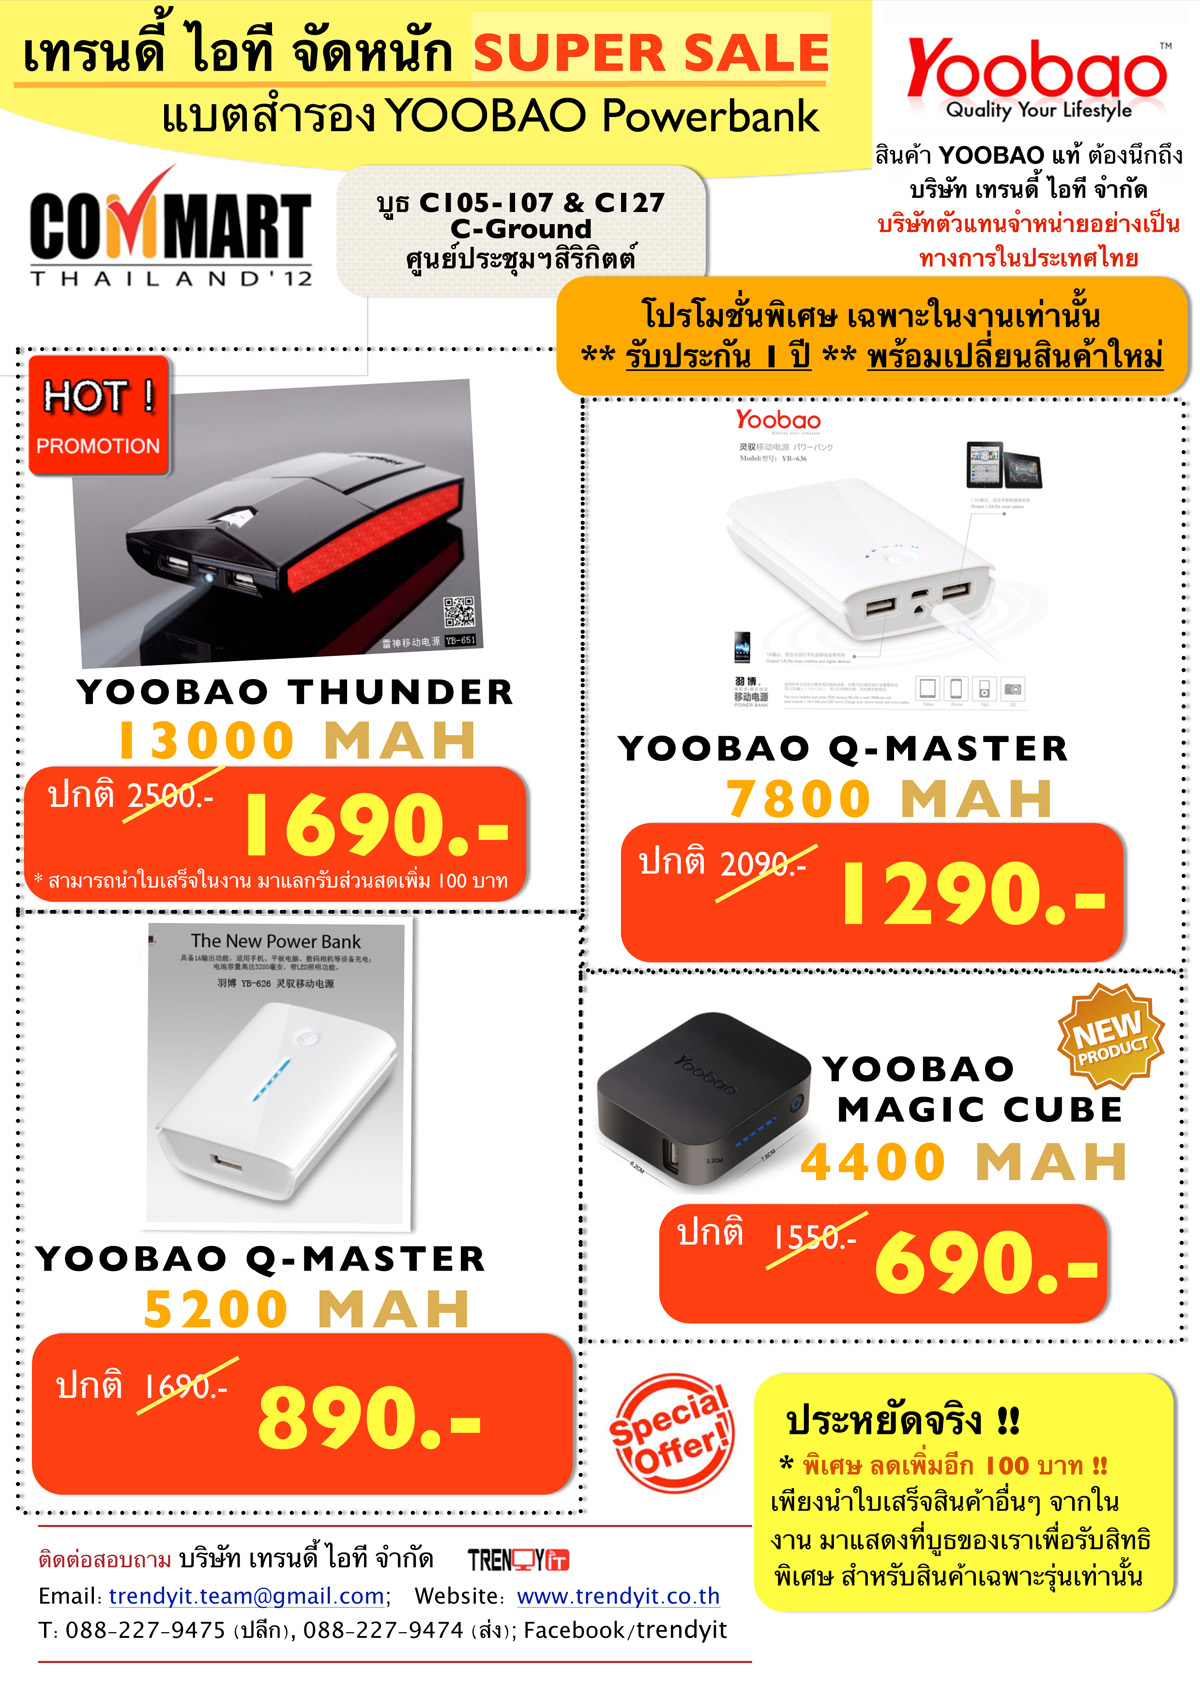 BrochureCommartWeb 1